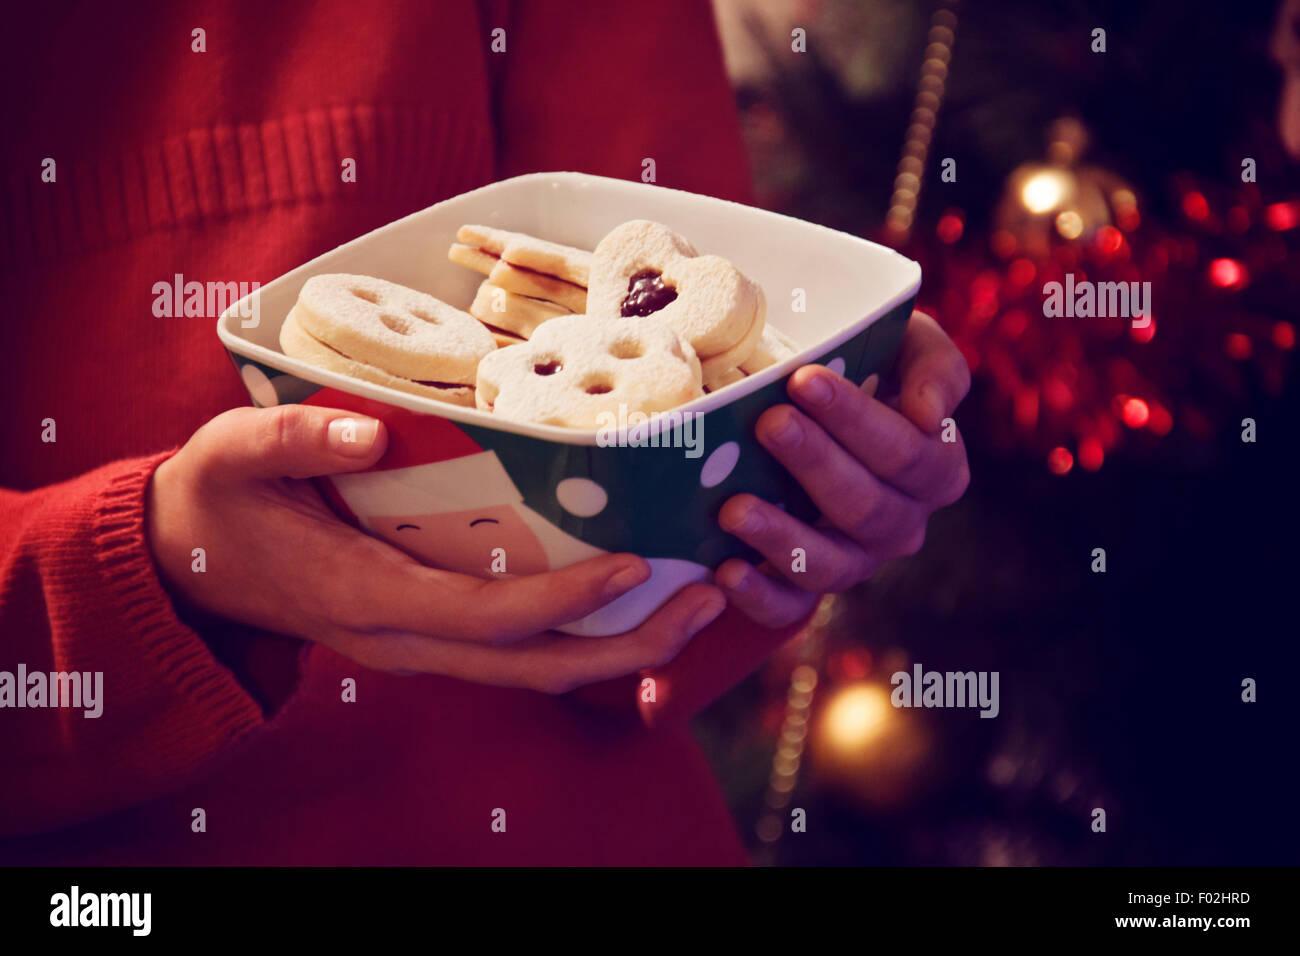 Mädchen halten Schüssel mit Weihnachtsgebäck Stockbild